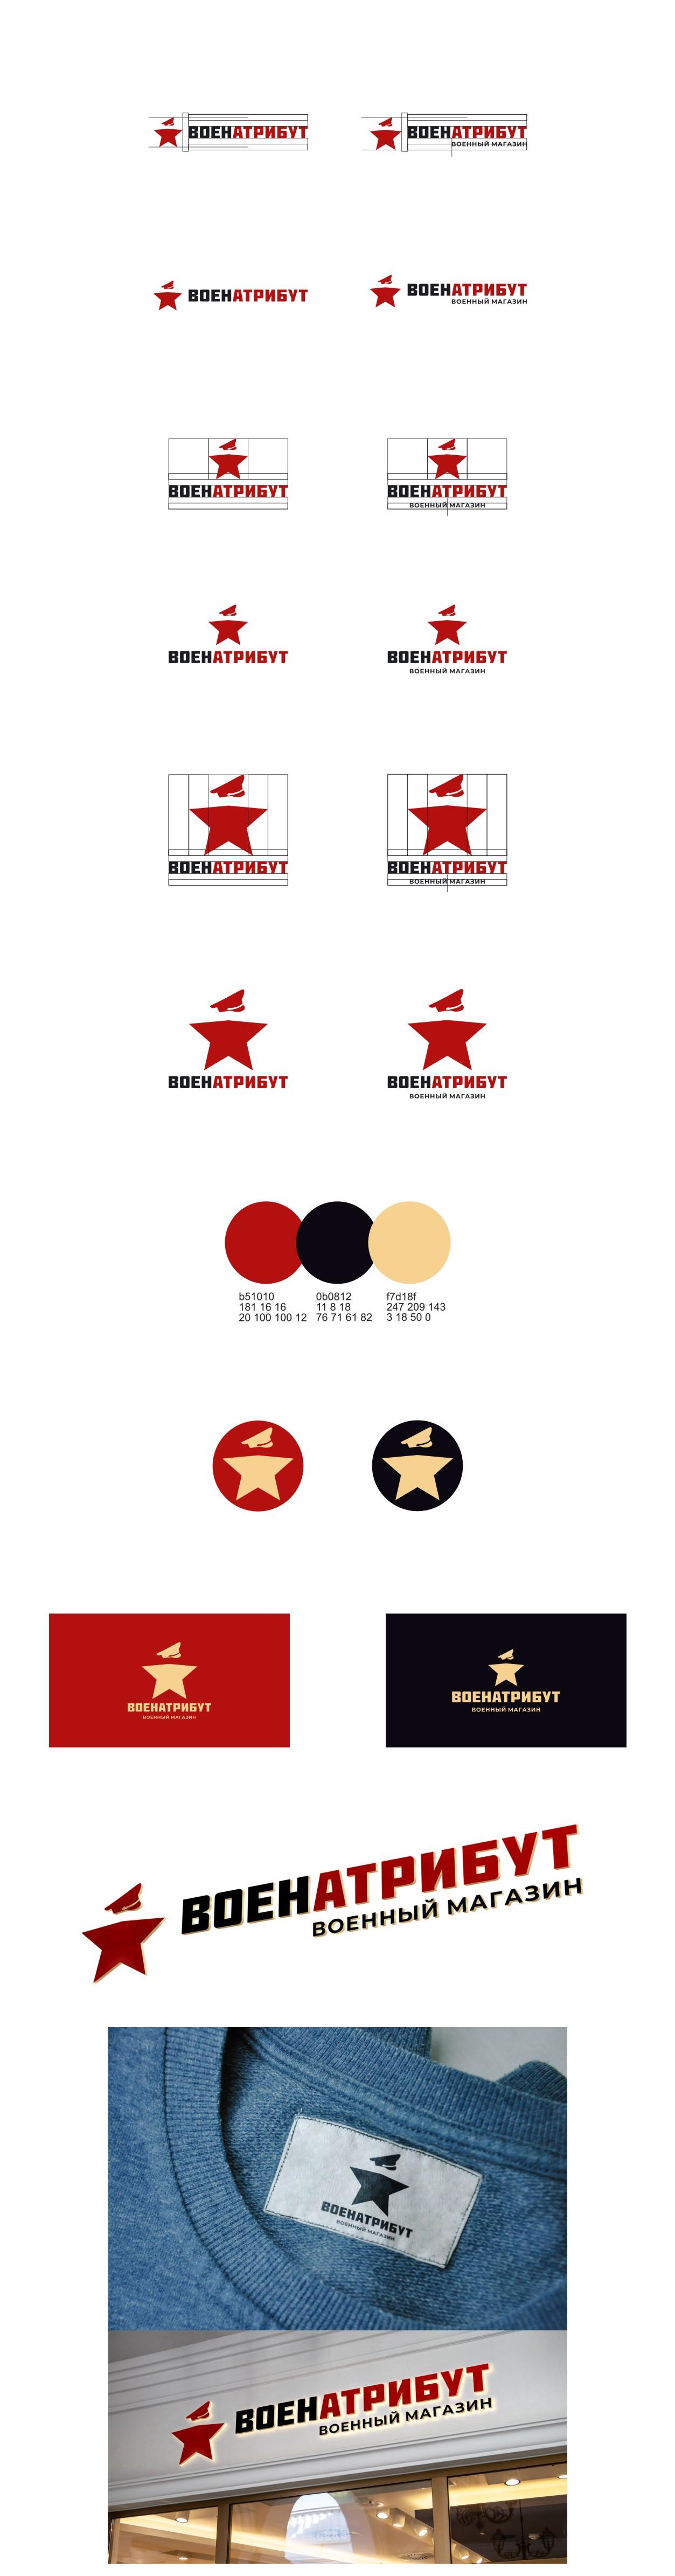 Разработка логотипа для компании военной тематики фото f_883601fcbc876f68.jpg